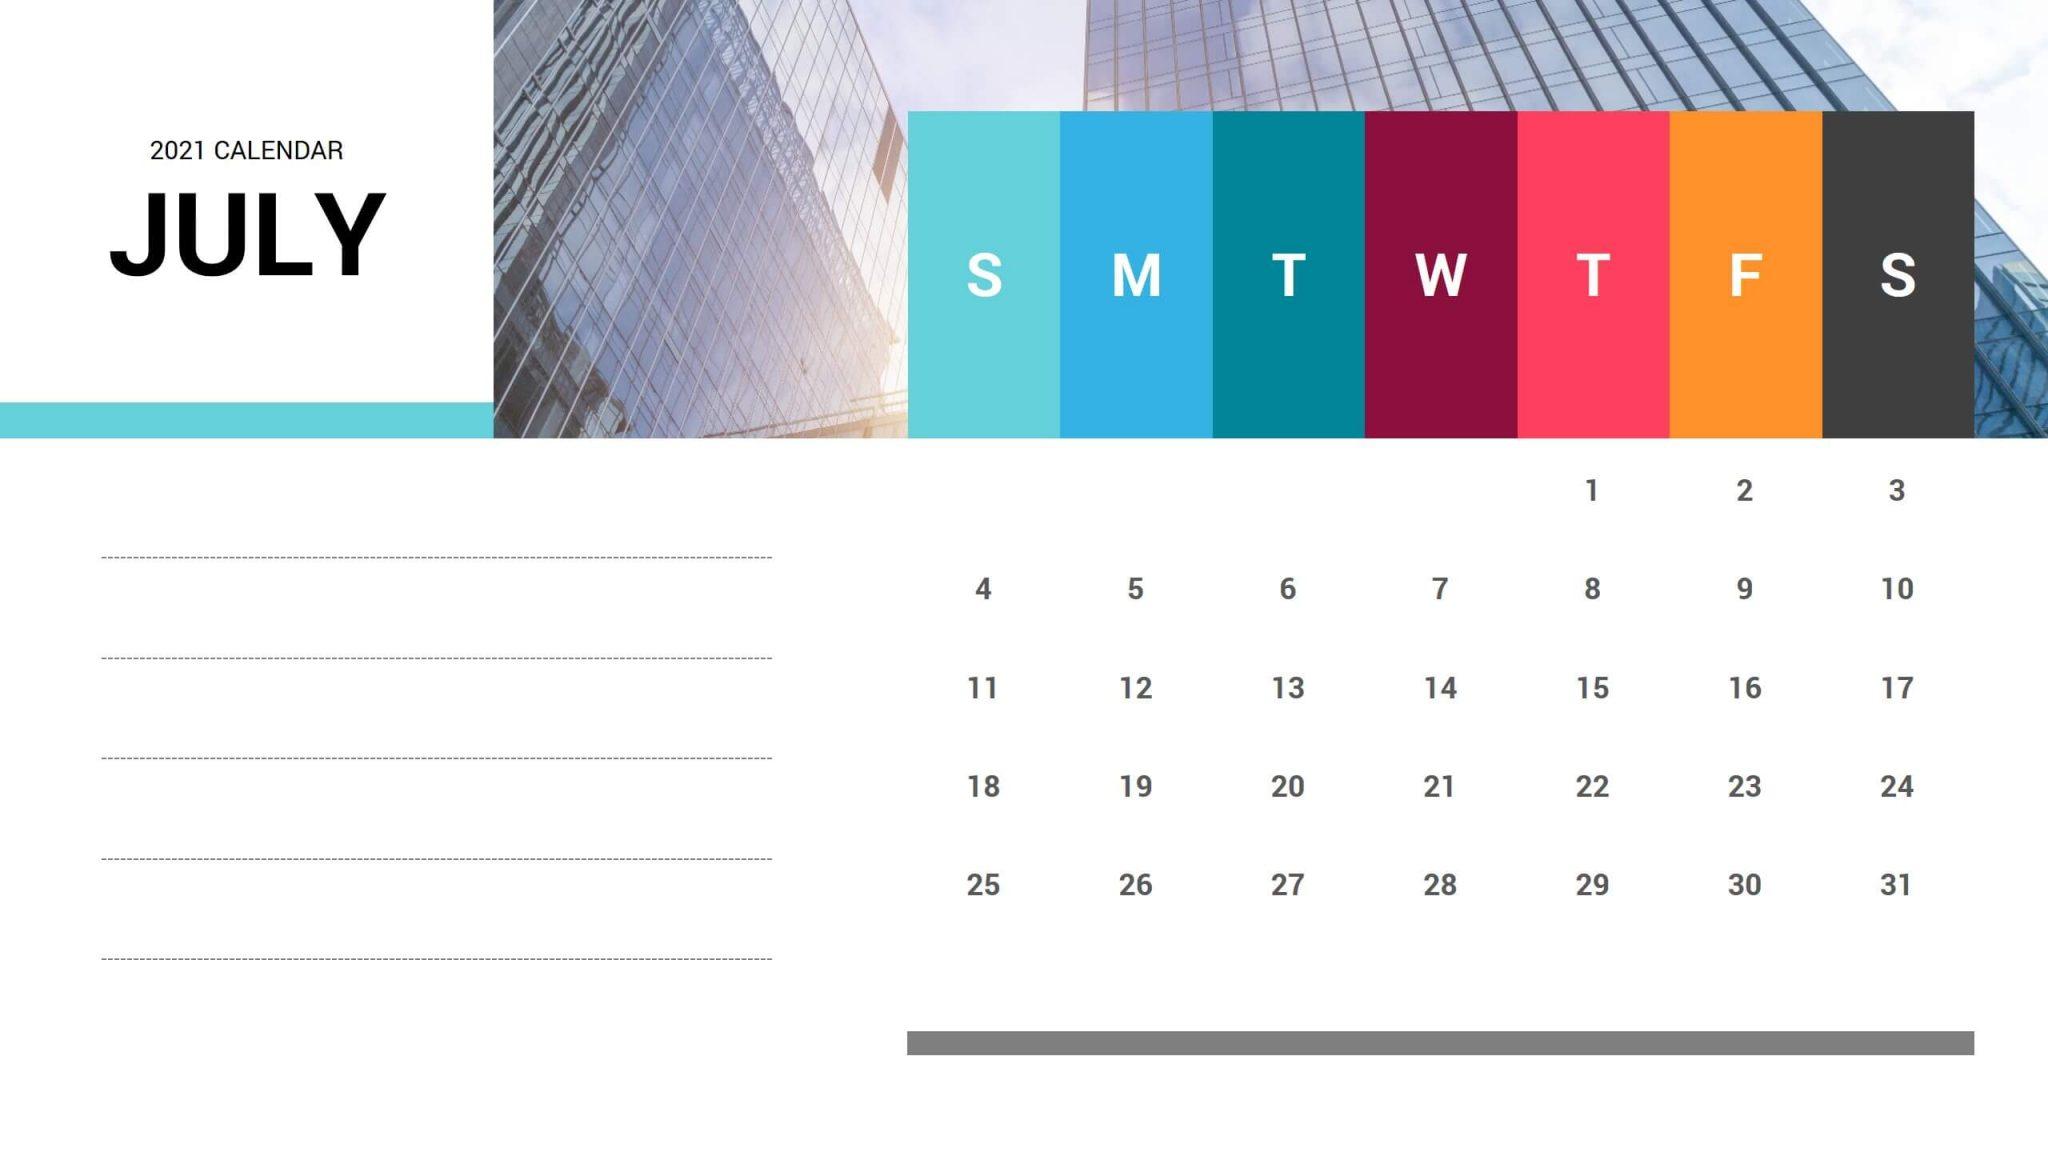 July 2021 Calendar Free PPT Template